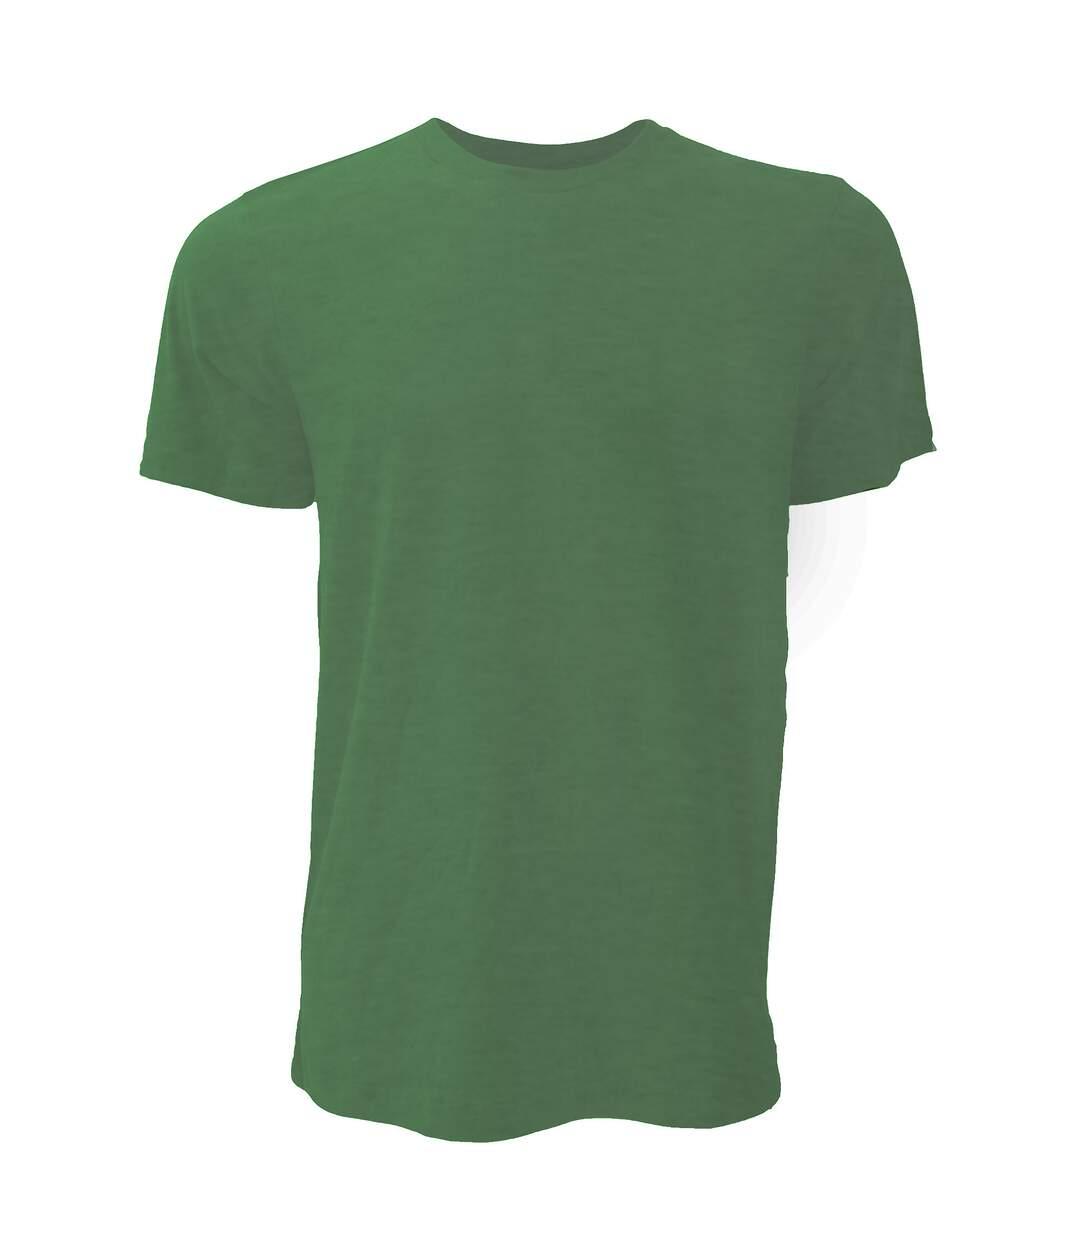 Canvas Unisex Jersey Crew Neck T-Shirt / Mens Short Sleeve T-Shirt (Heather Forest) - UTBC163